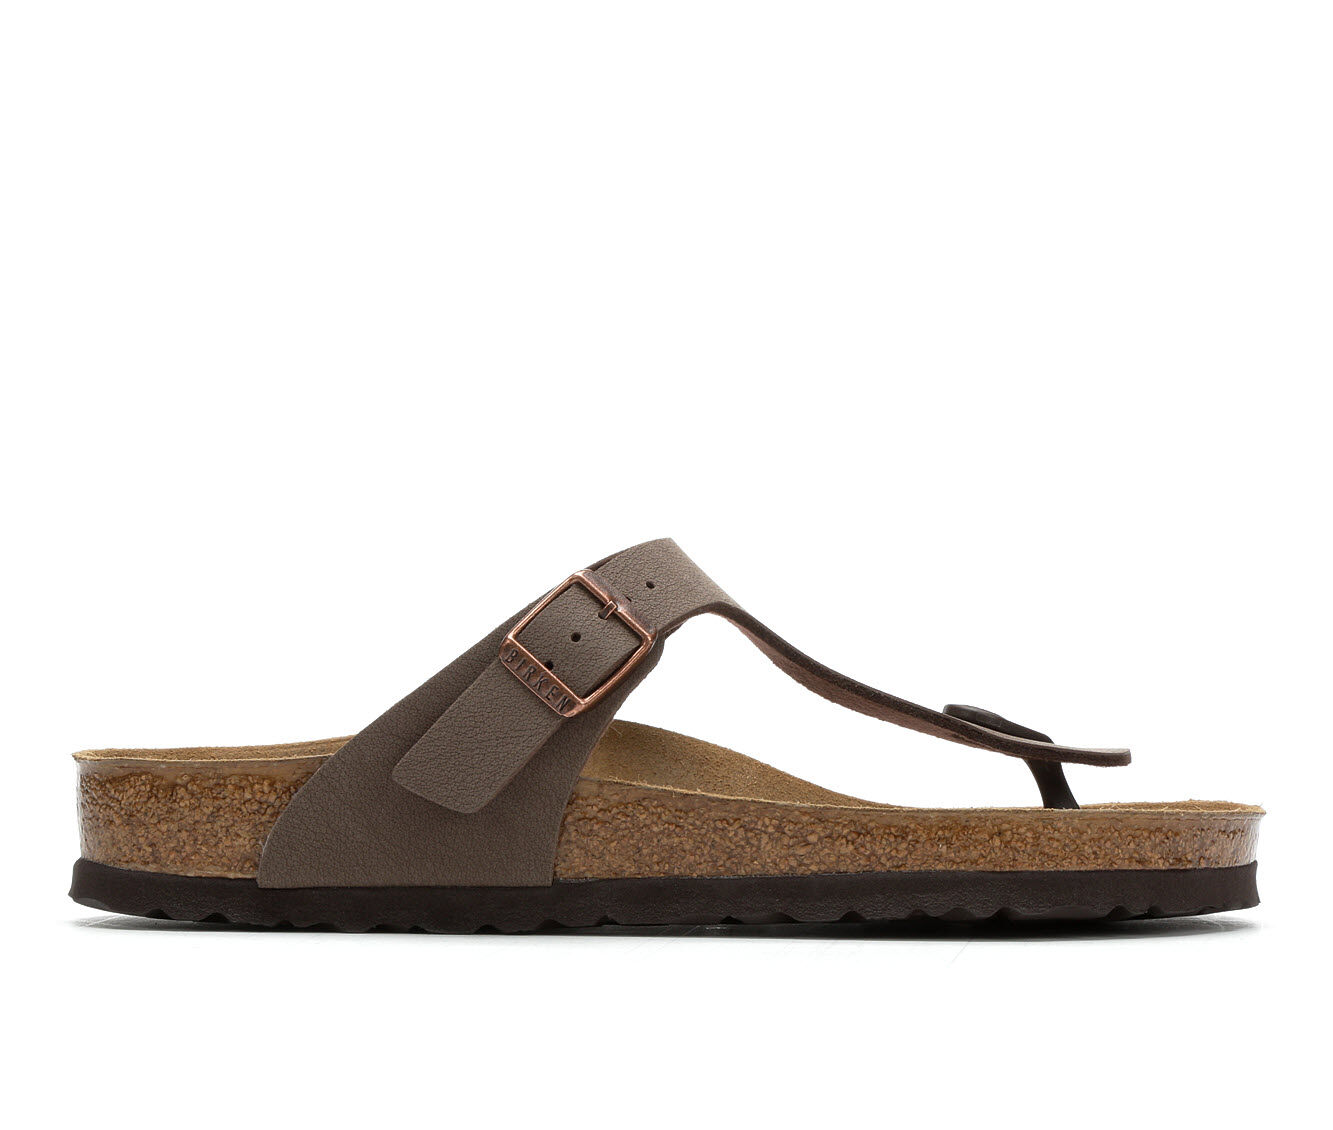 uk shoes_kd6831